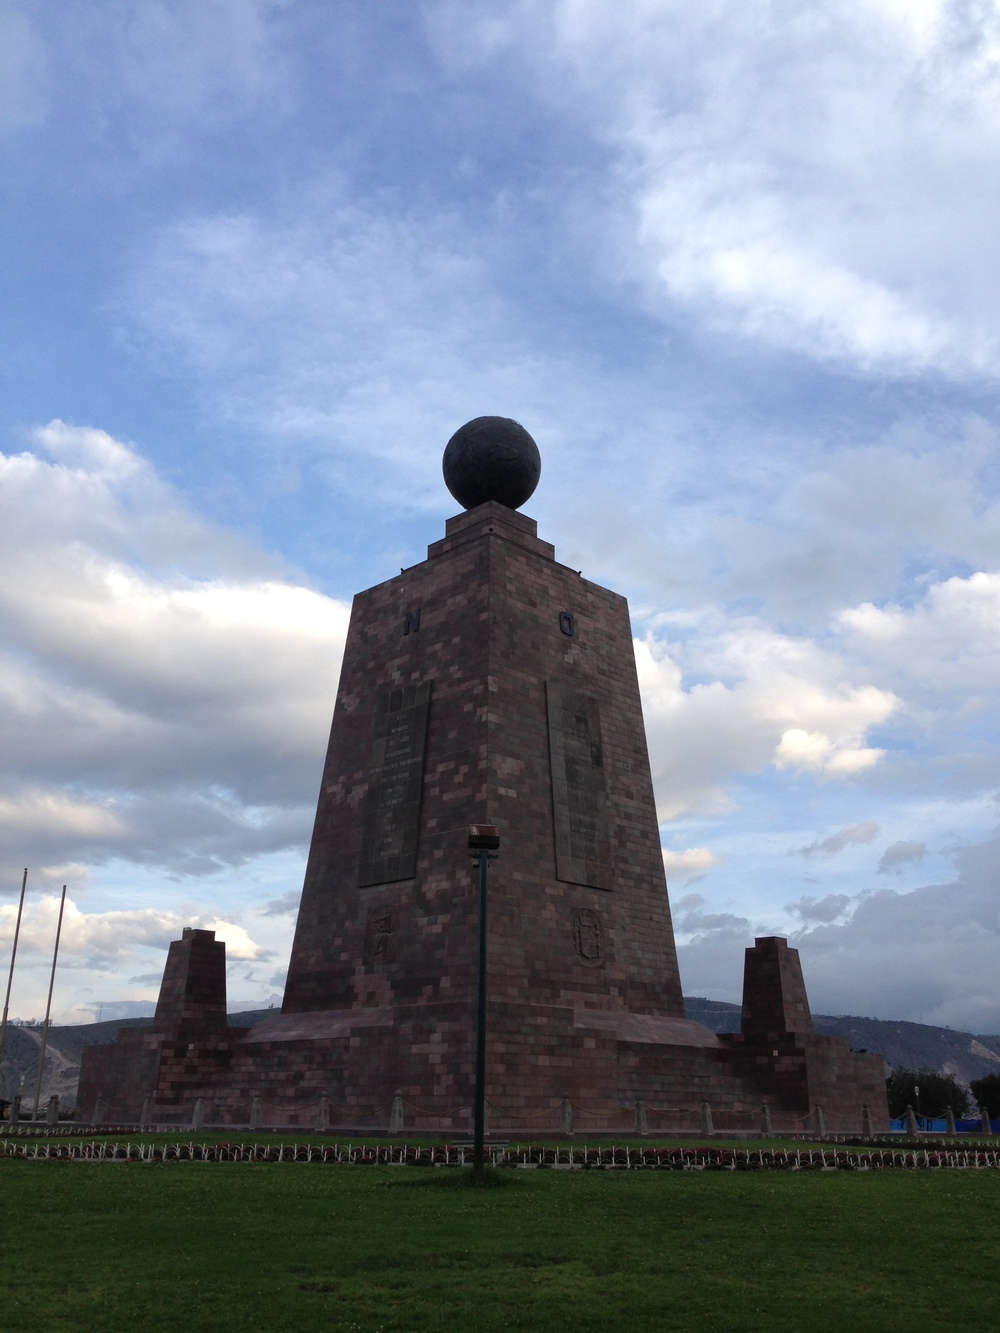 Mitad del Mundo - the original